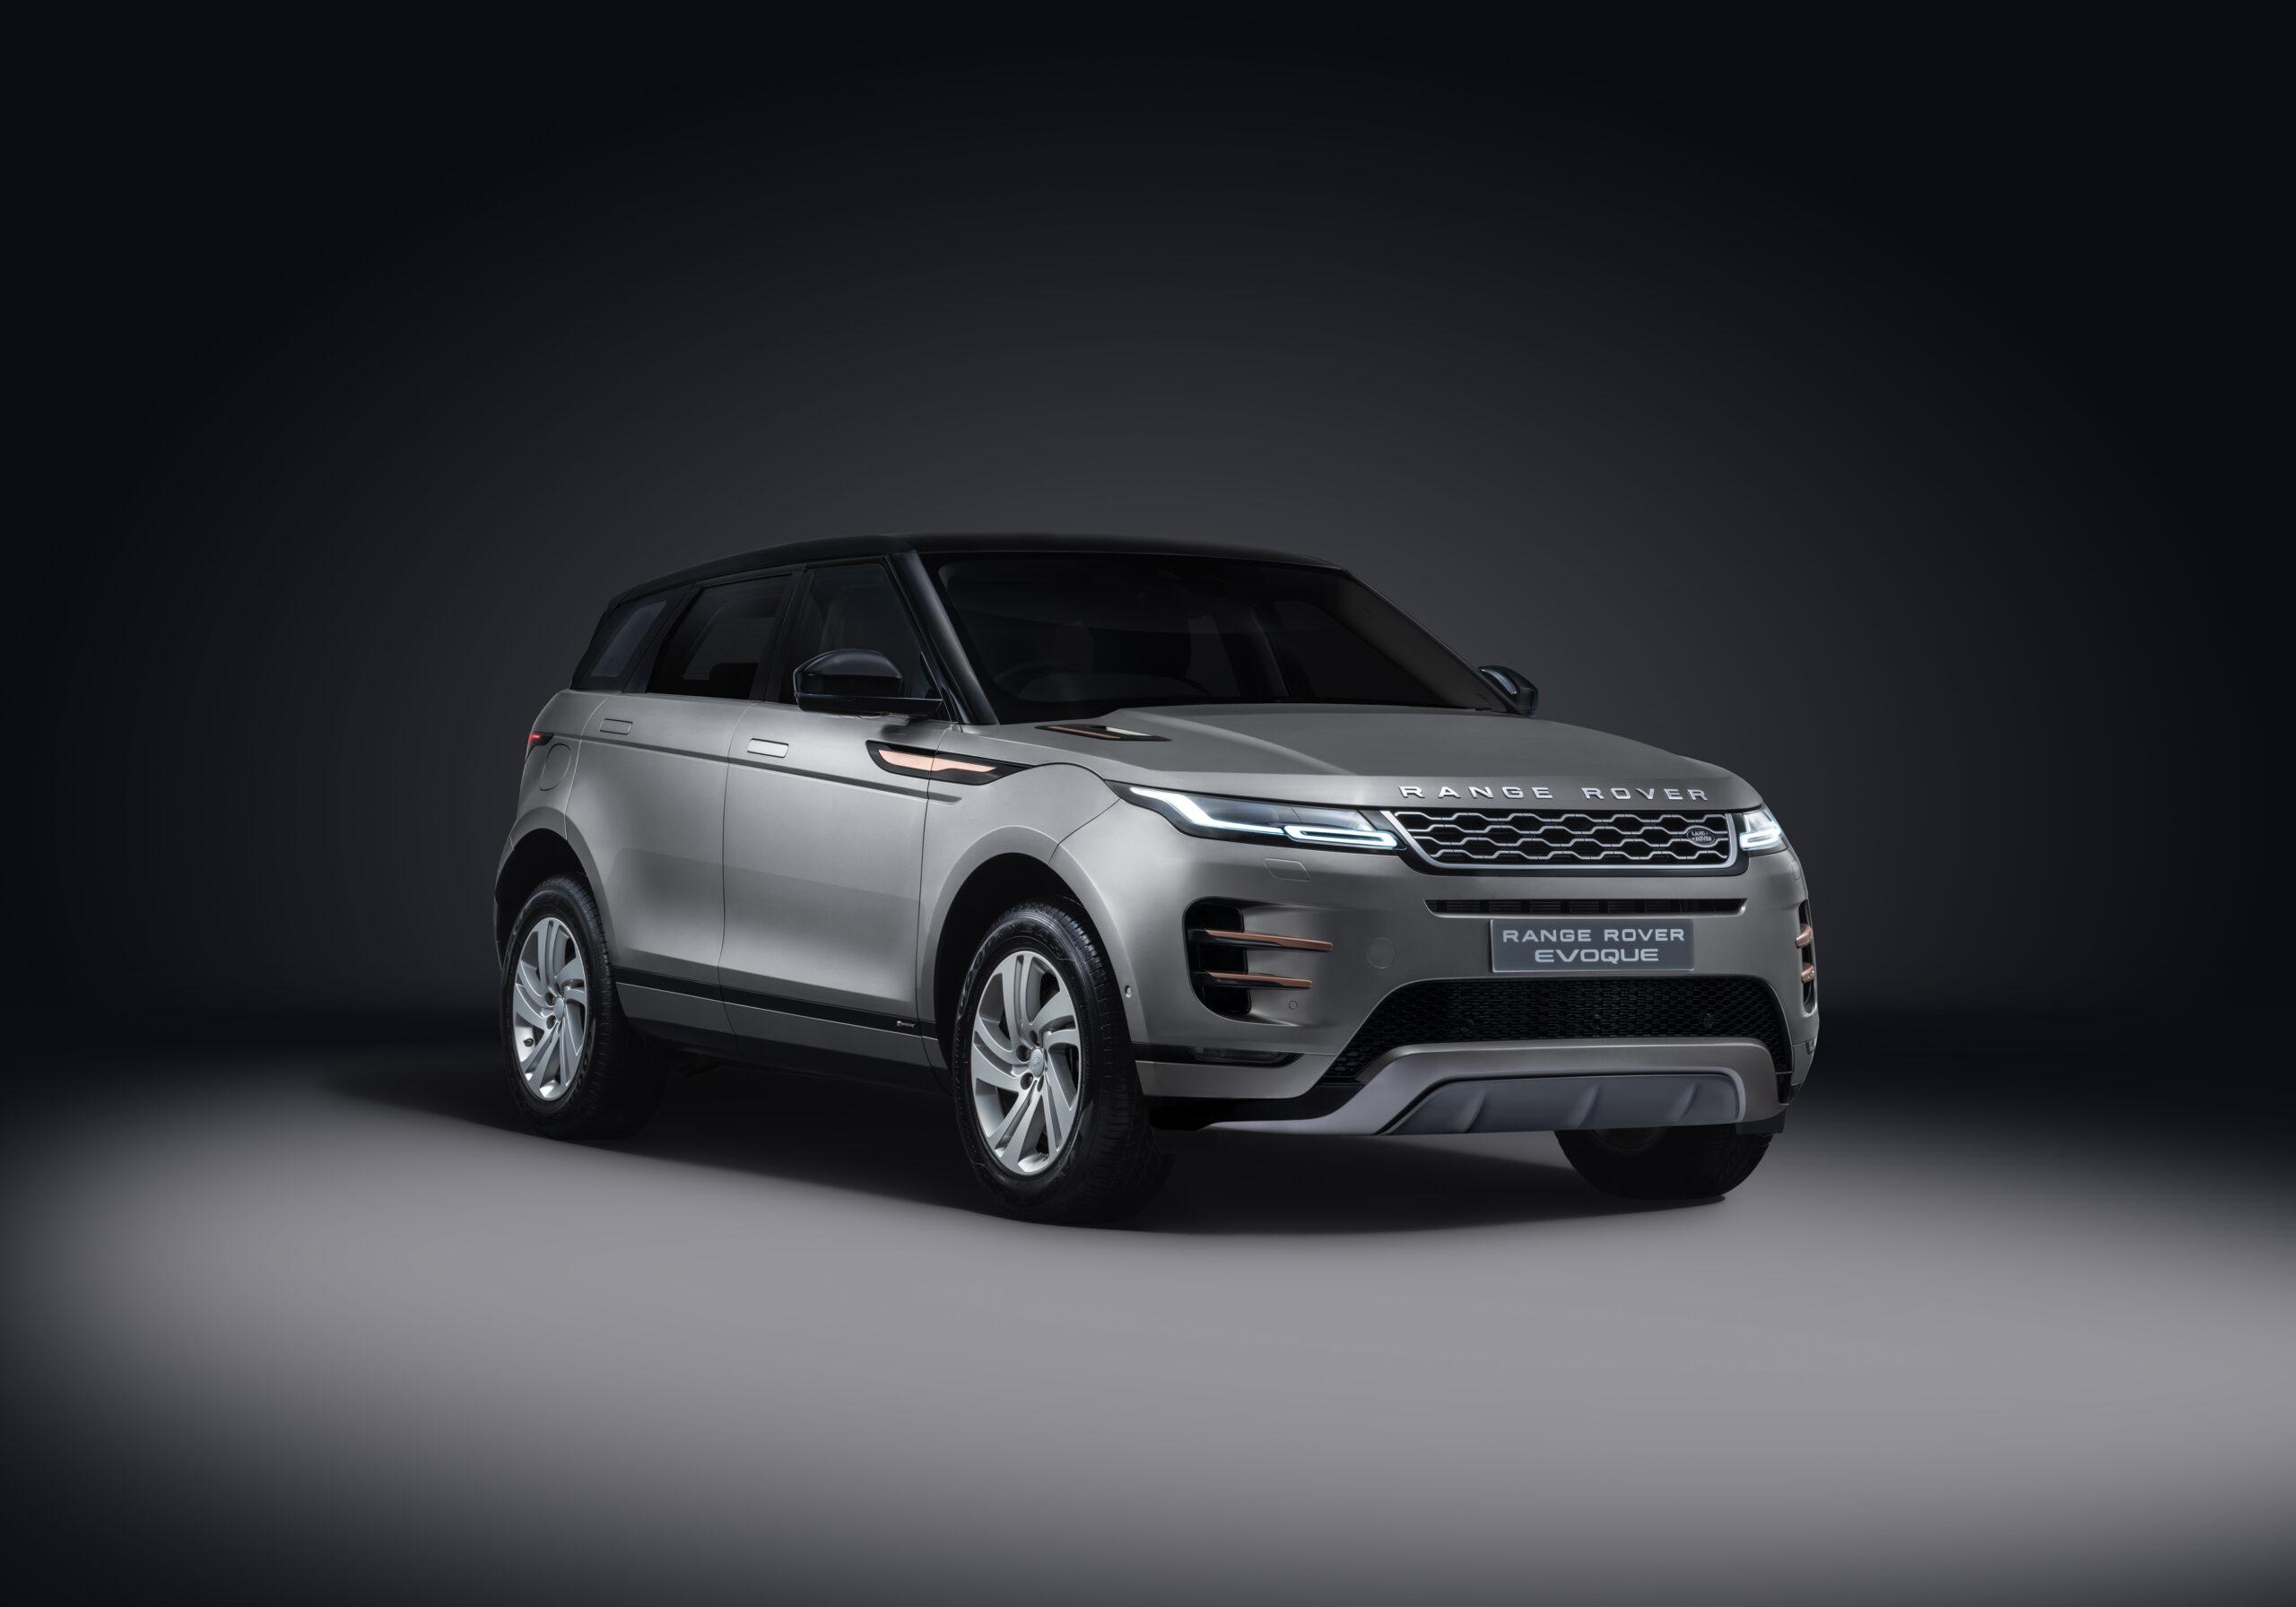 Range Rover Evoque introduced